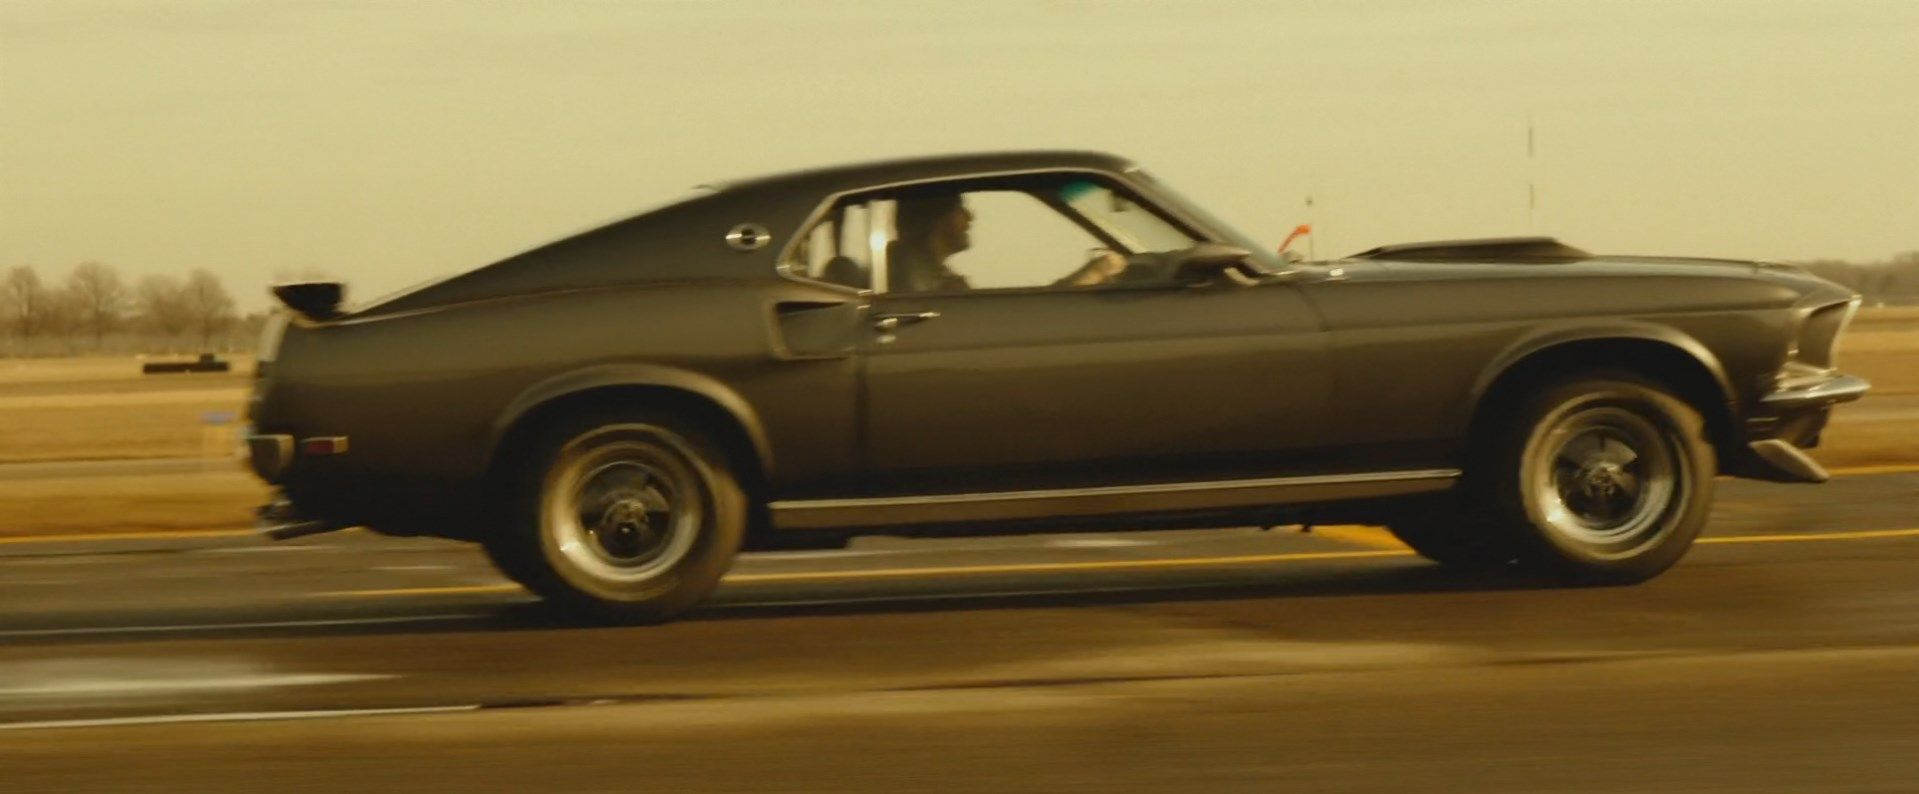 Image For John Wick Car Mustang John Wick Car Cars Movie Mustang